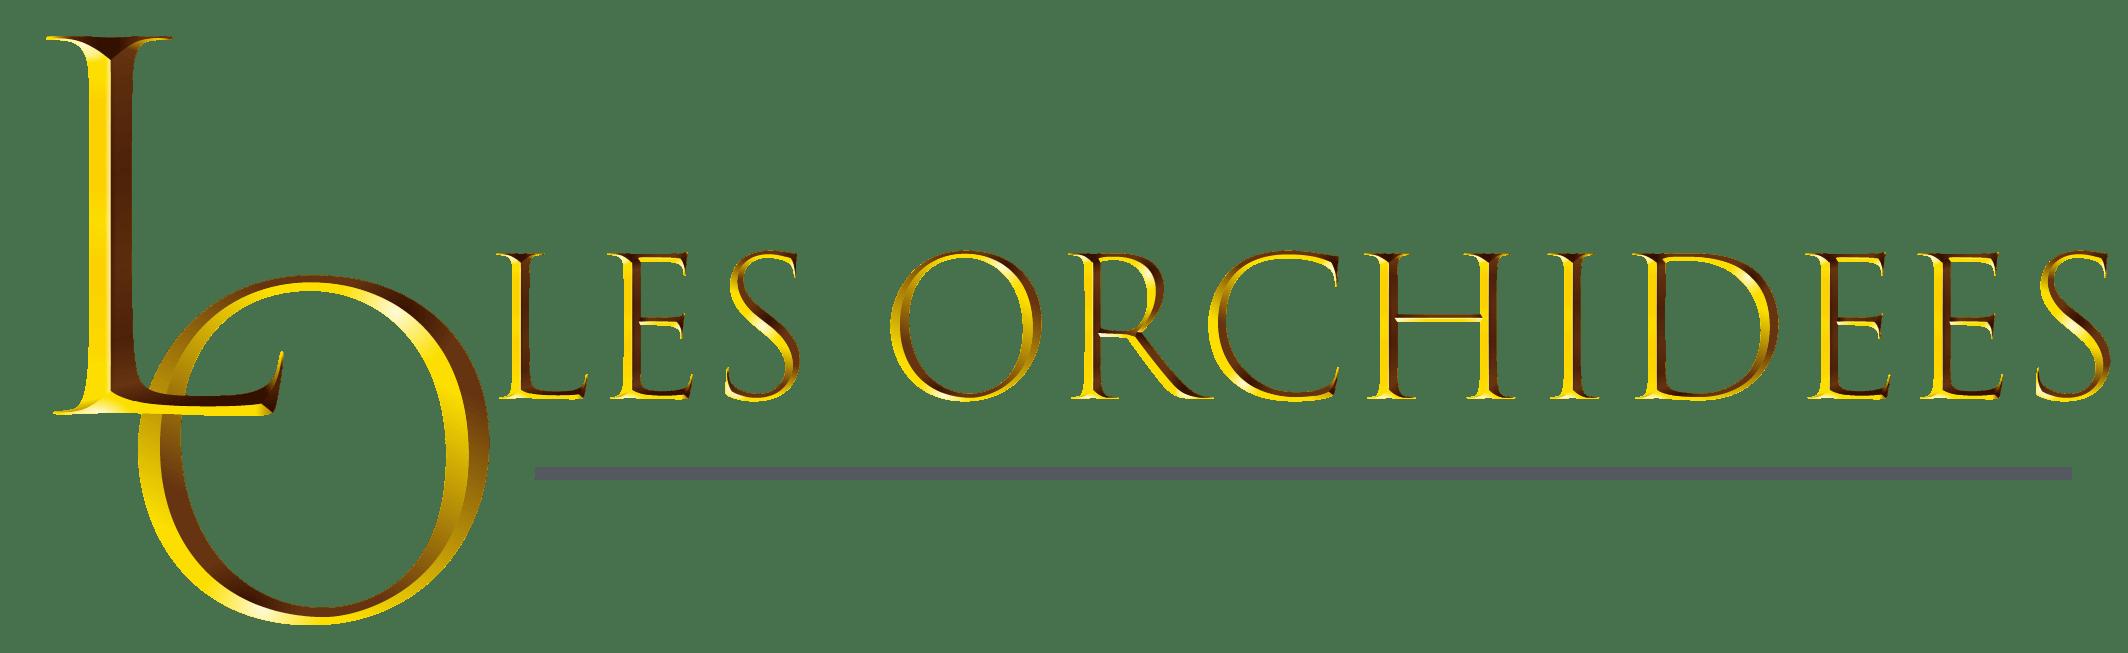 Chambres d'hôtes les Orchidées à Jaunay-Marigny